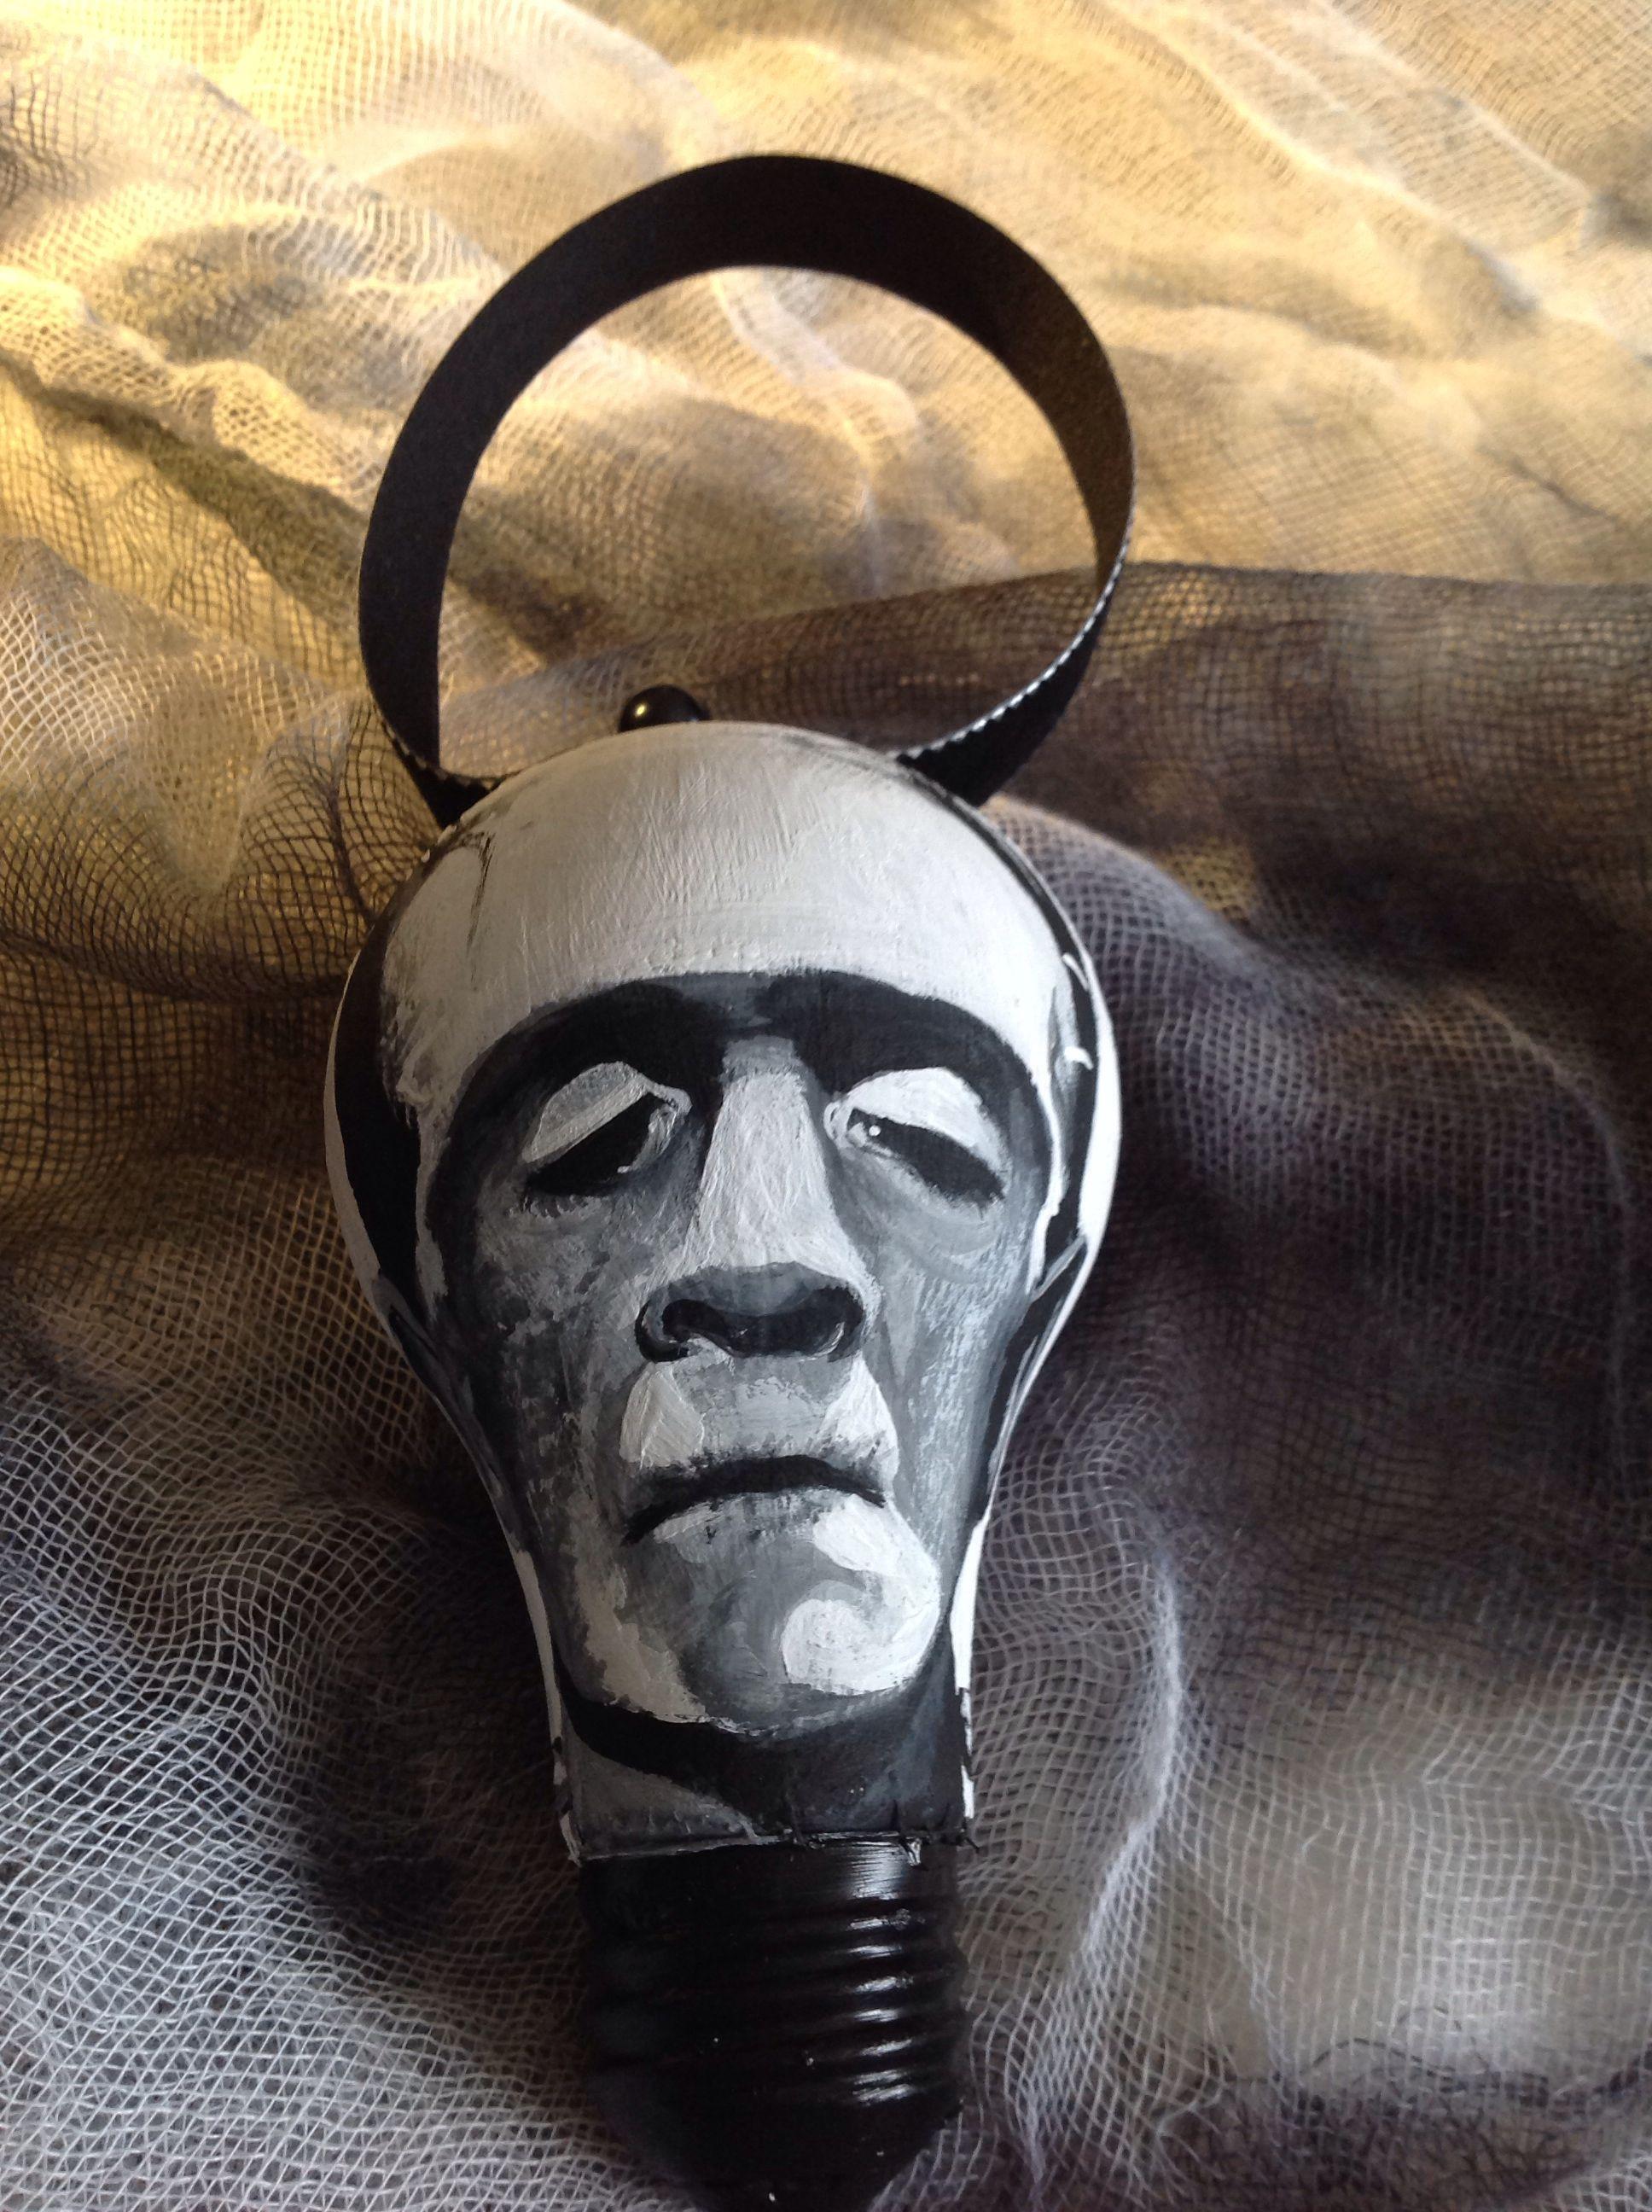 Frankenstein ornament using a burnt out light bulb ...